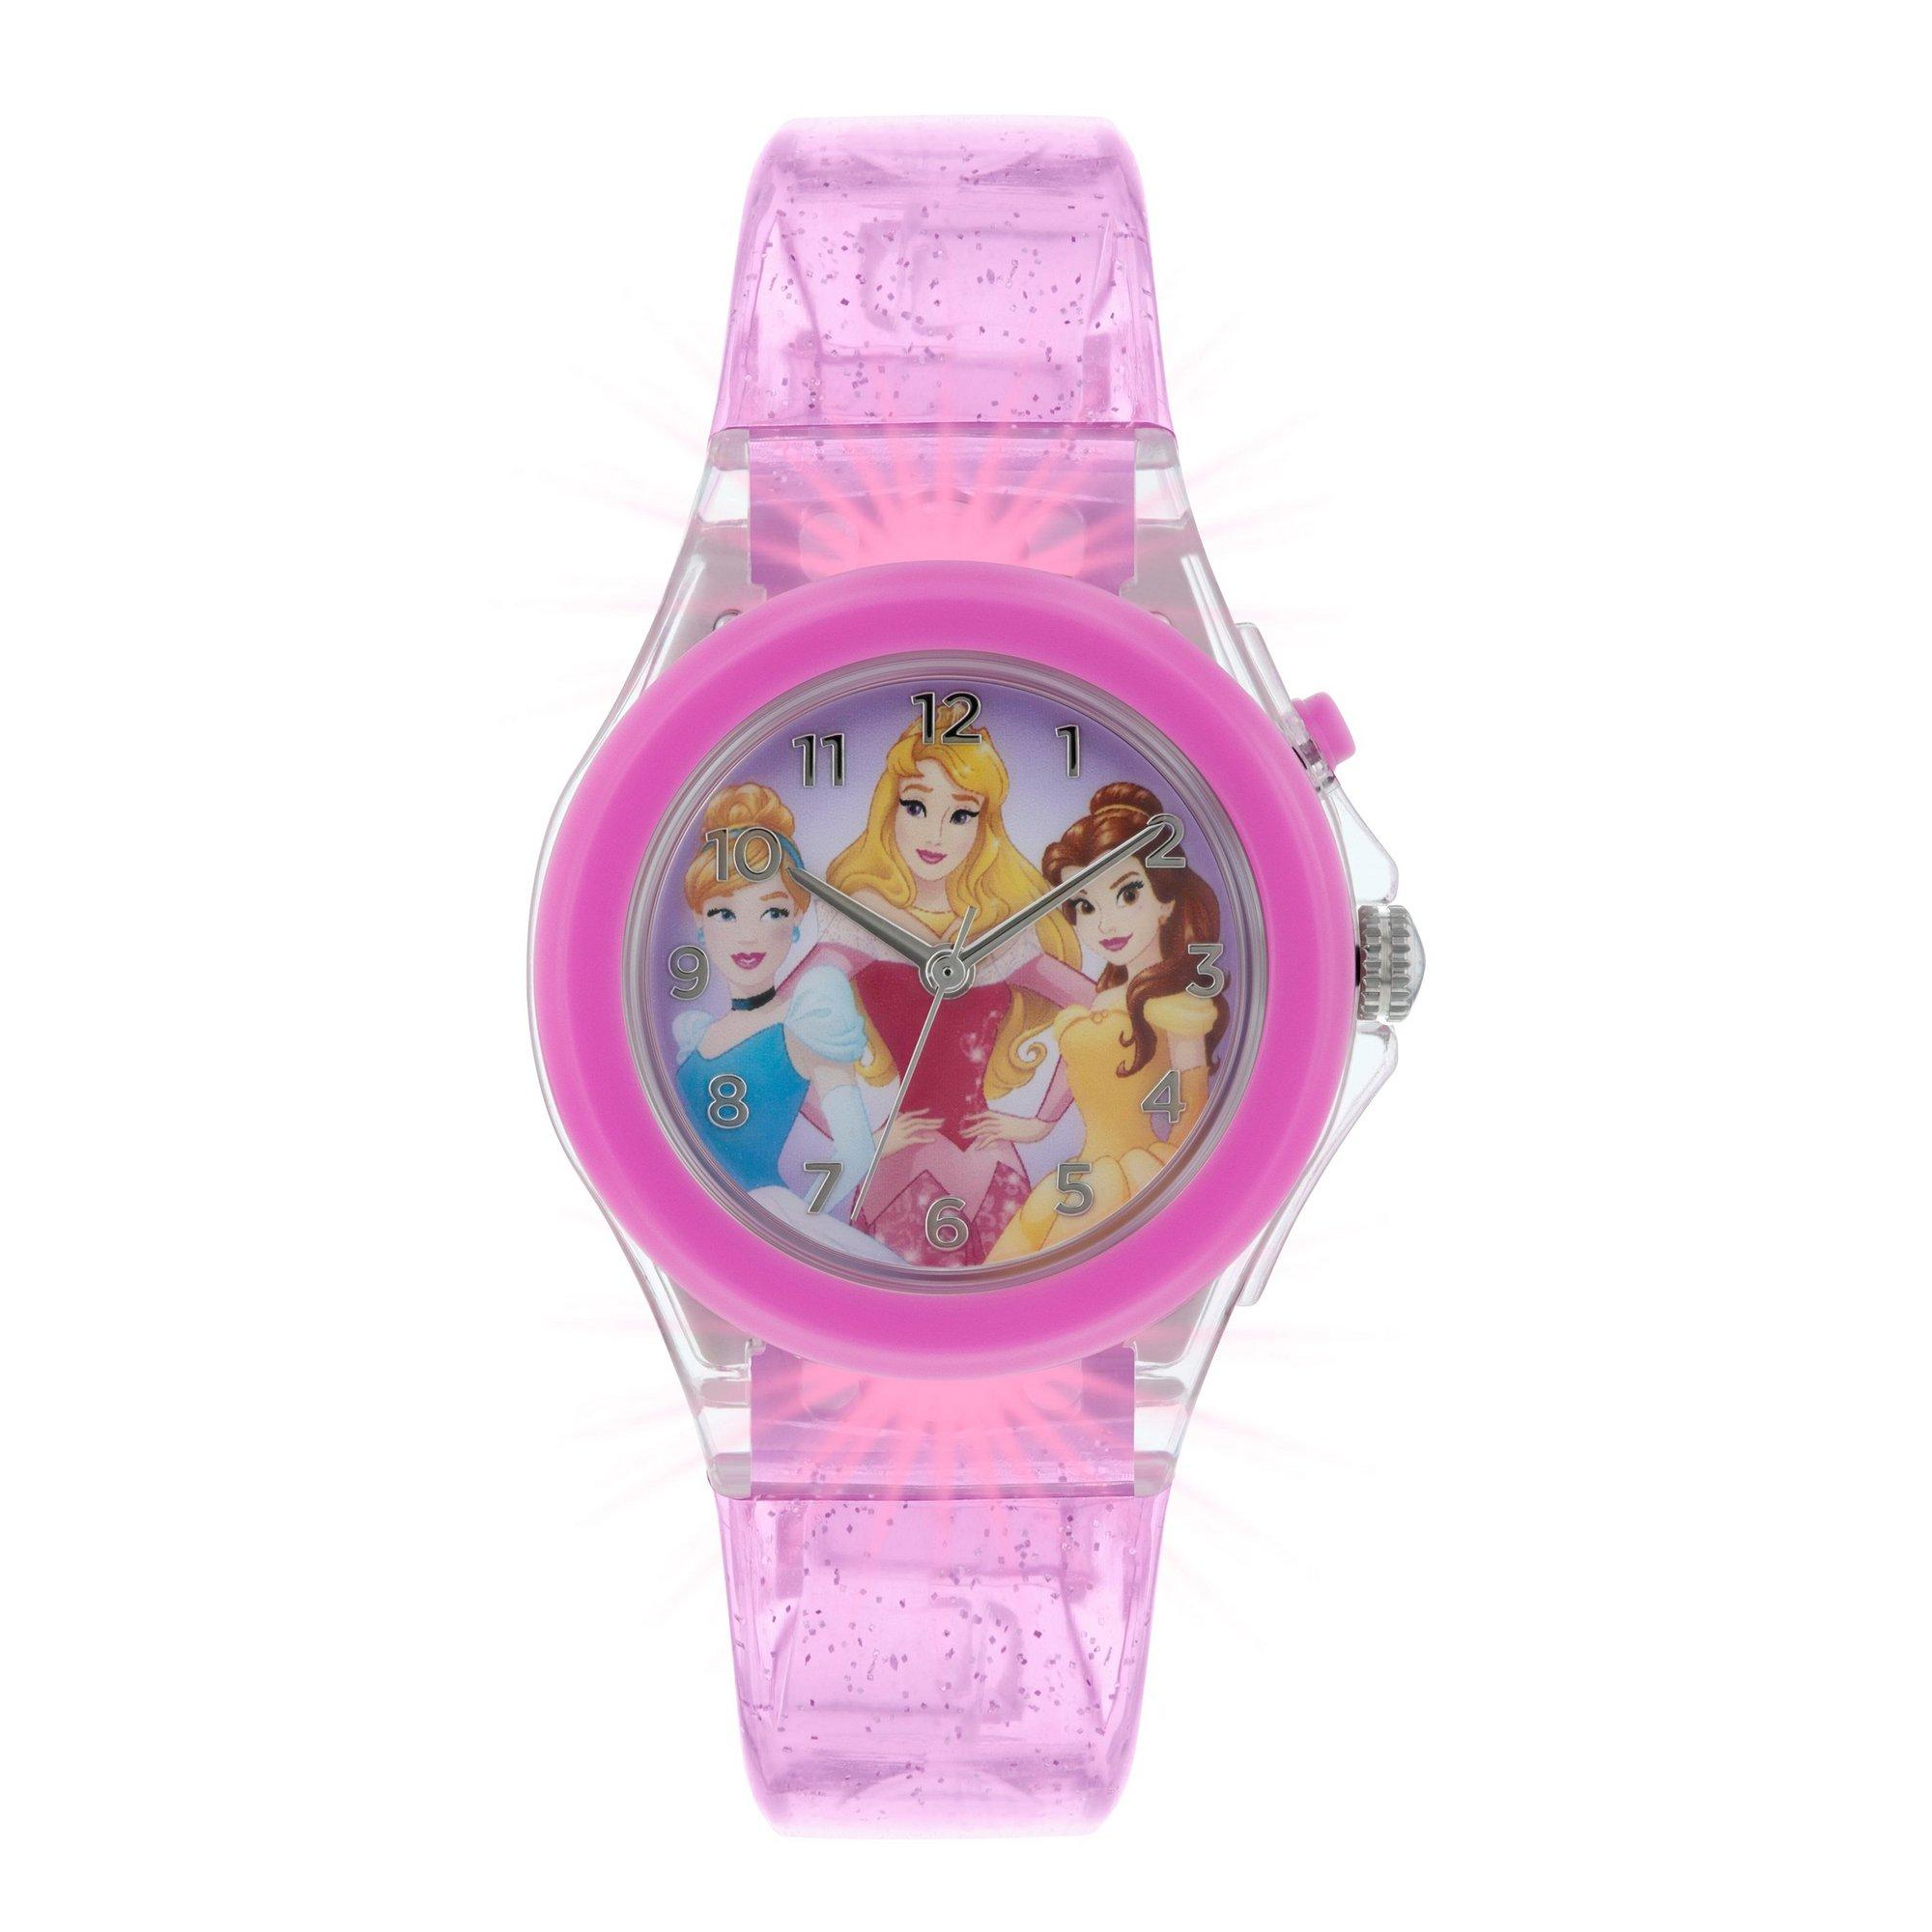 disney princess pink silicone analogue watch